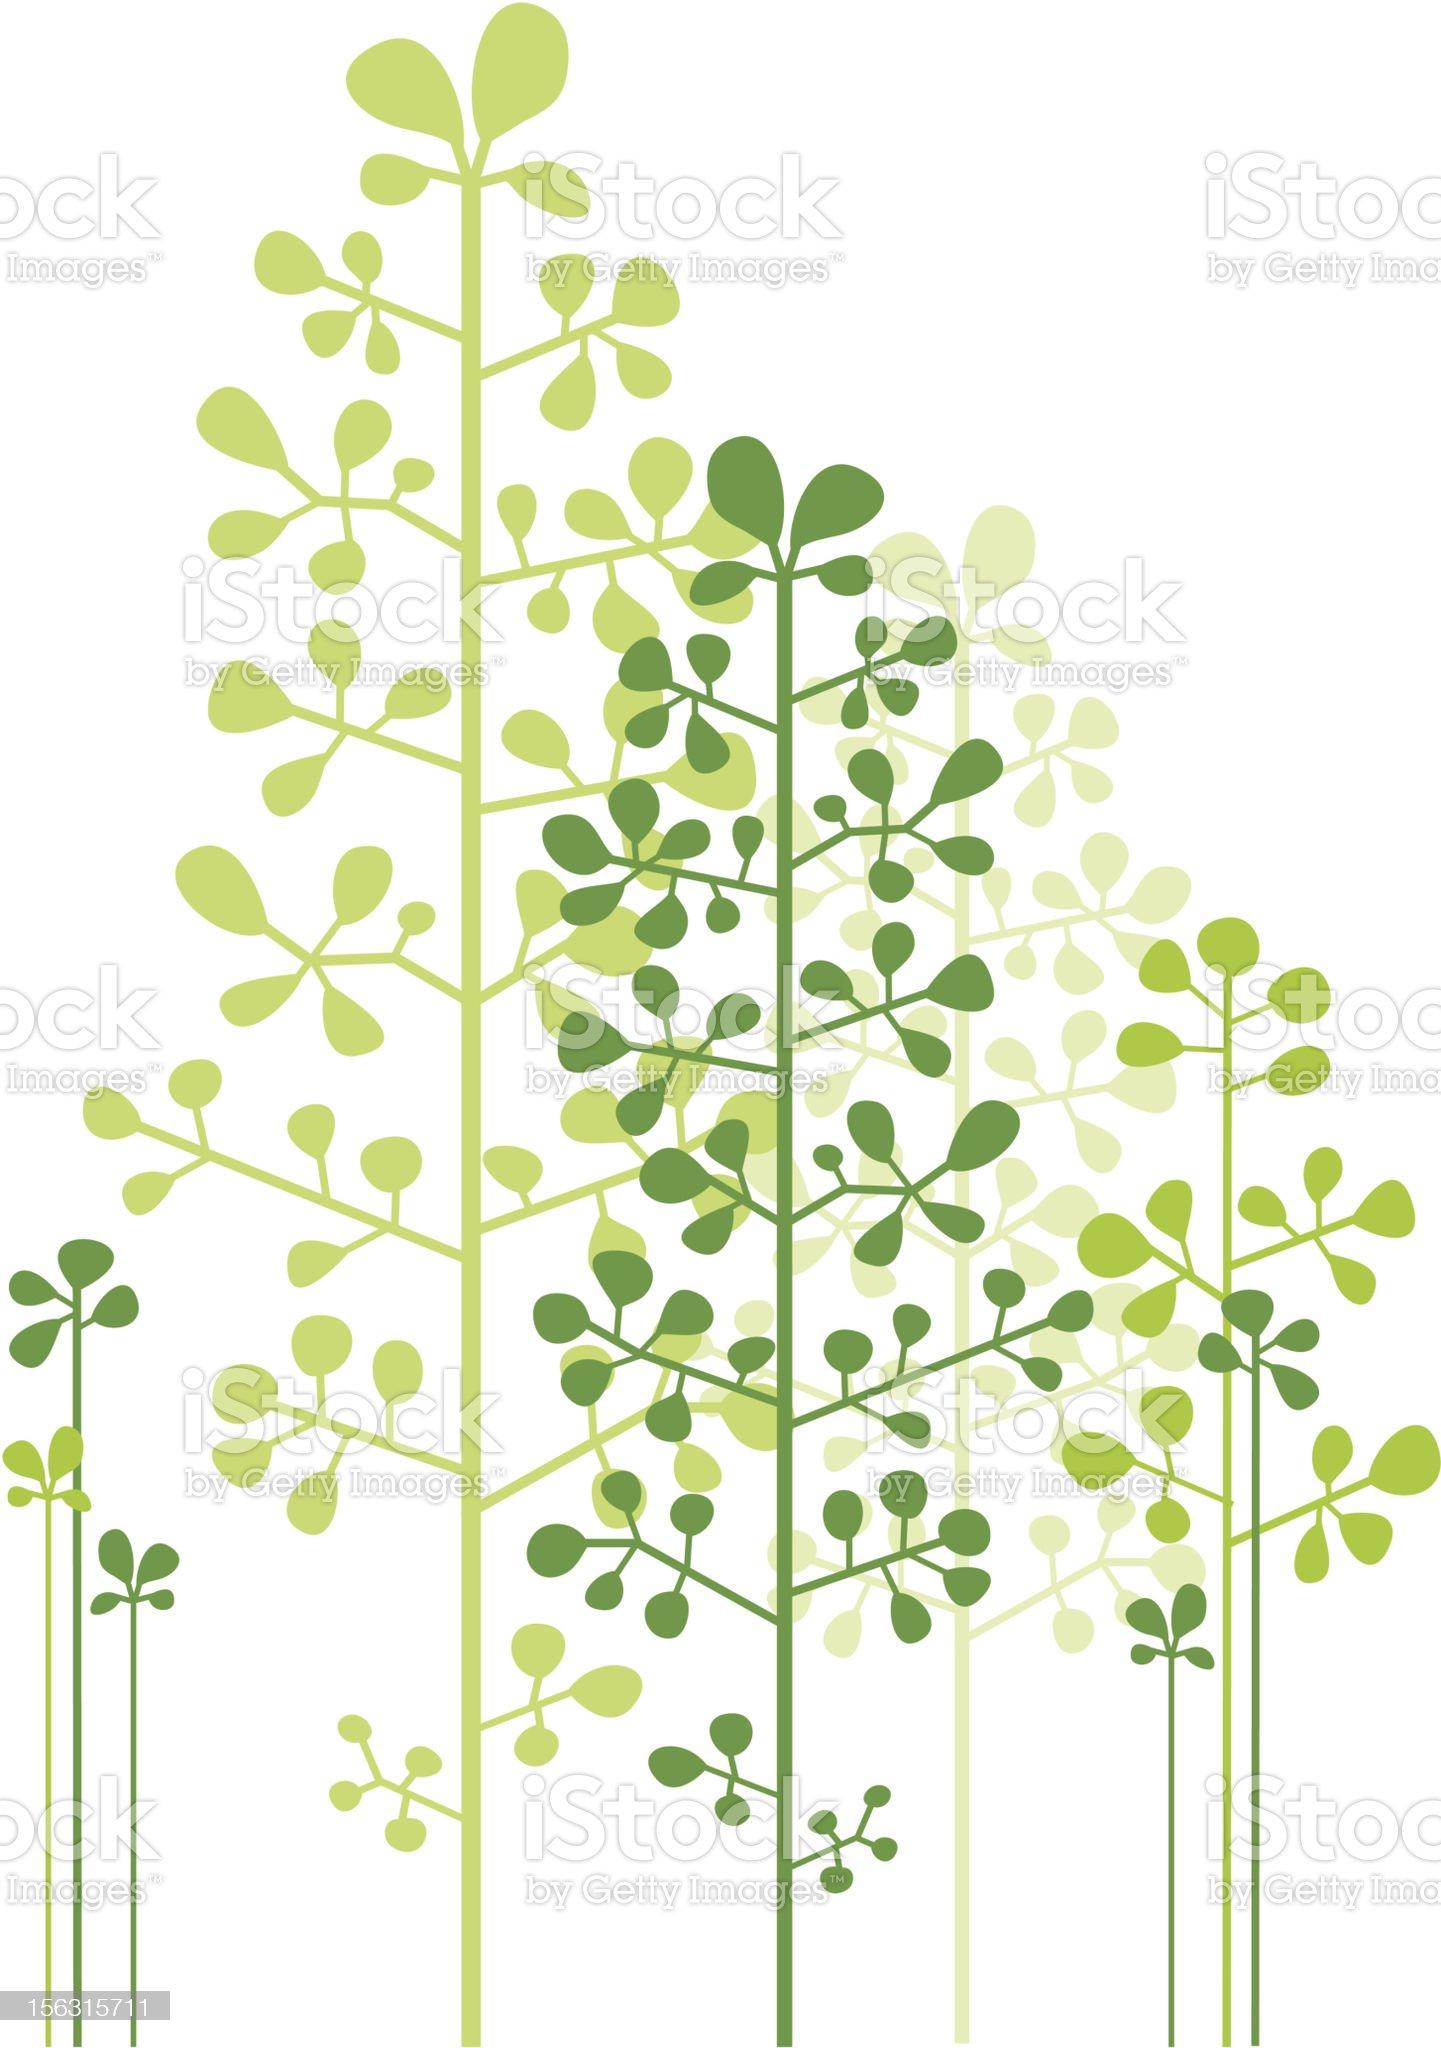 abstract green trees royalty-free stock vector art